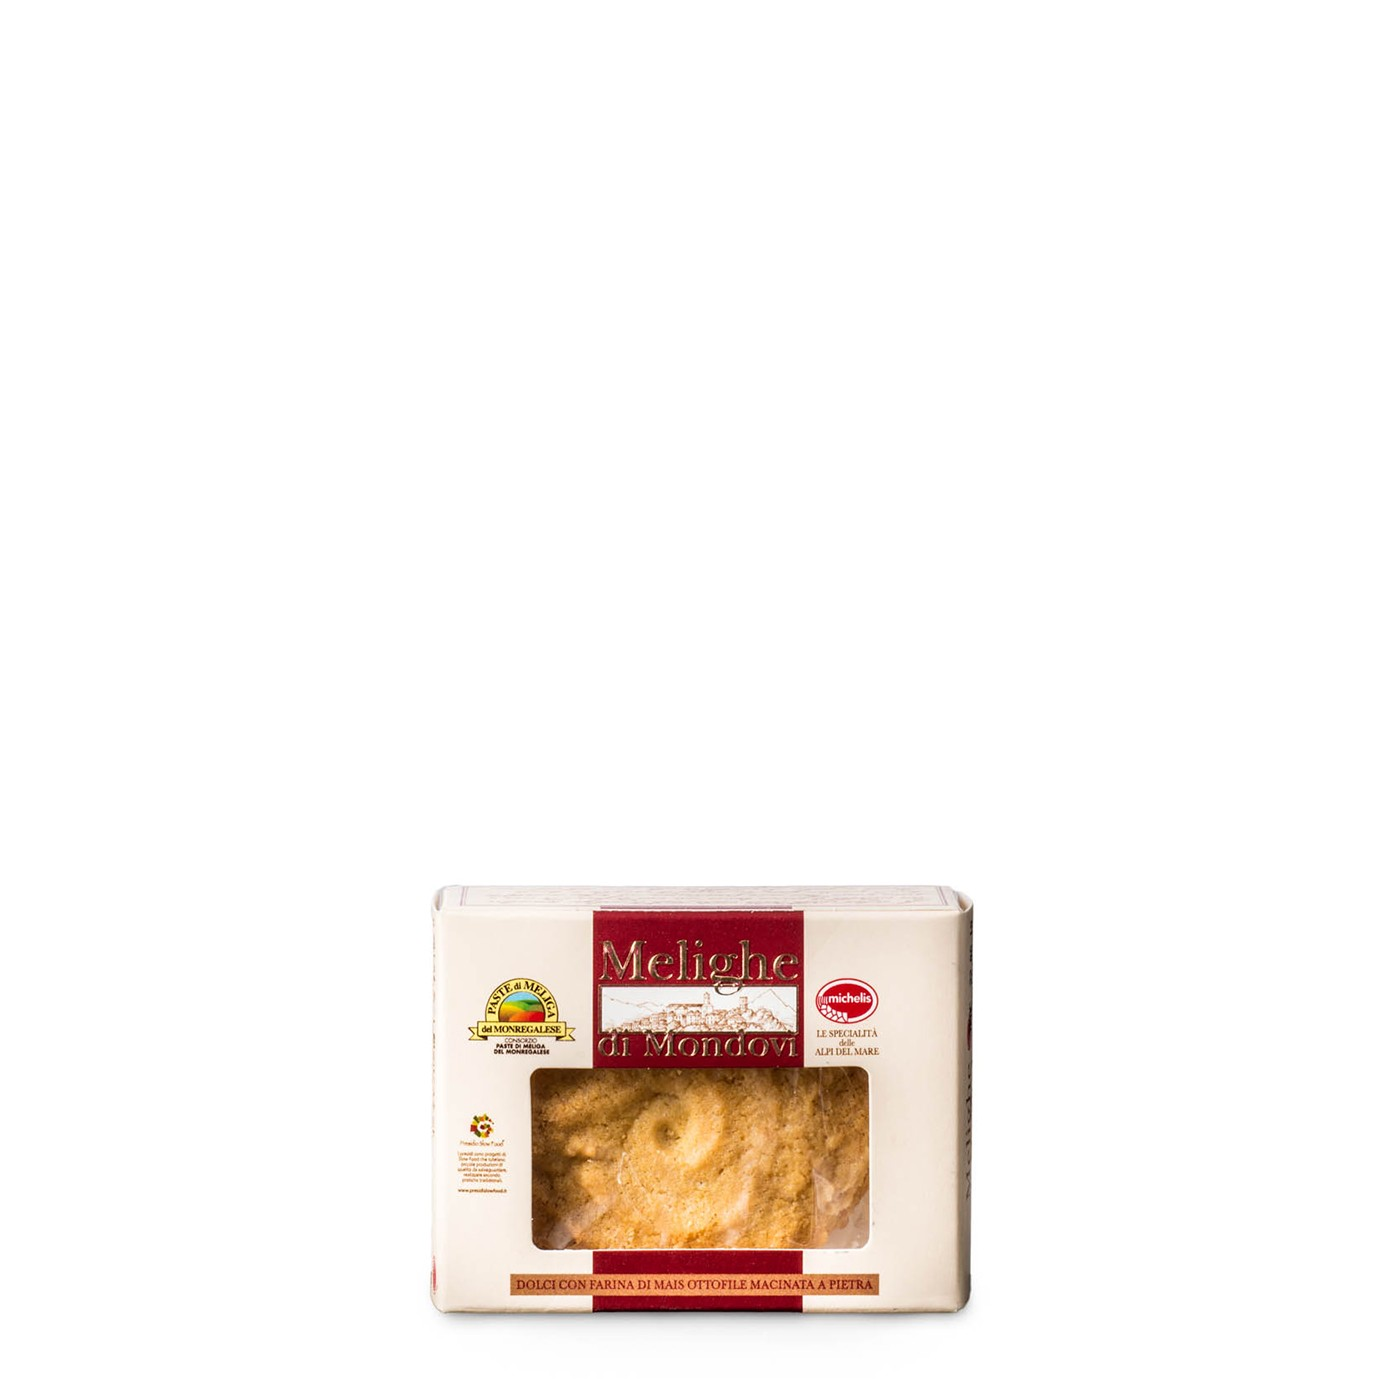 Melighe Cookies 1 oz